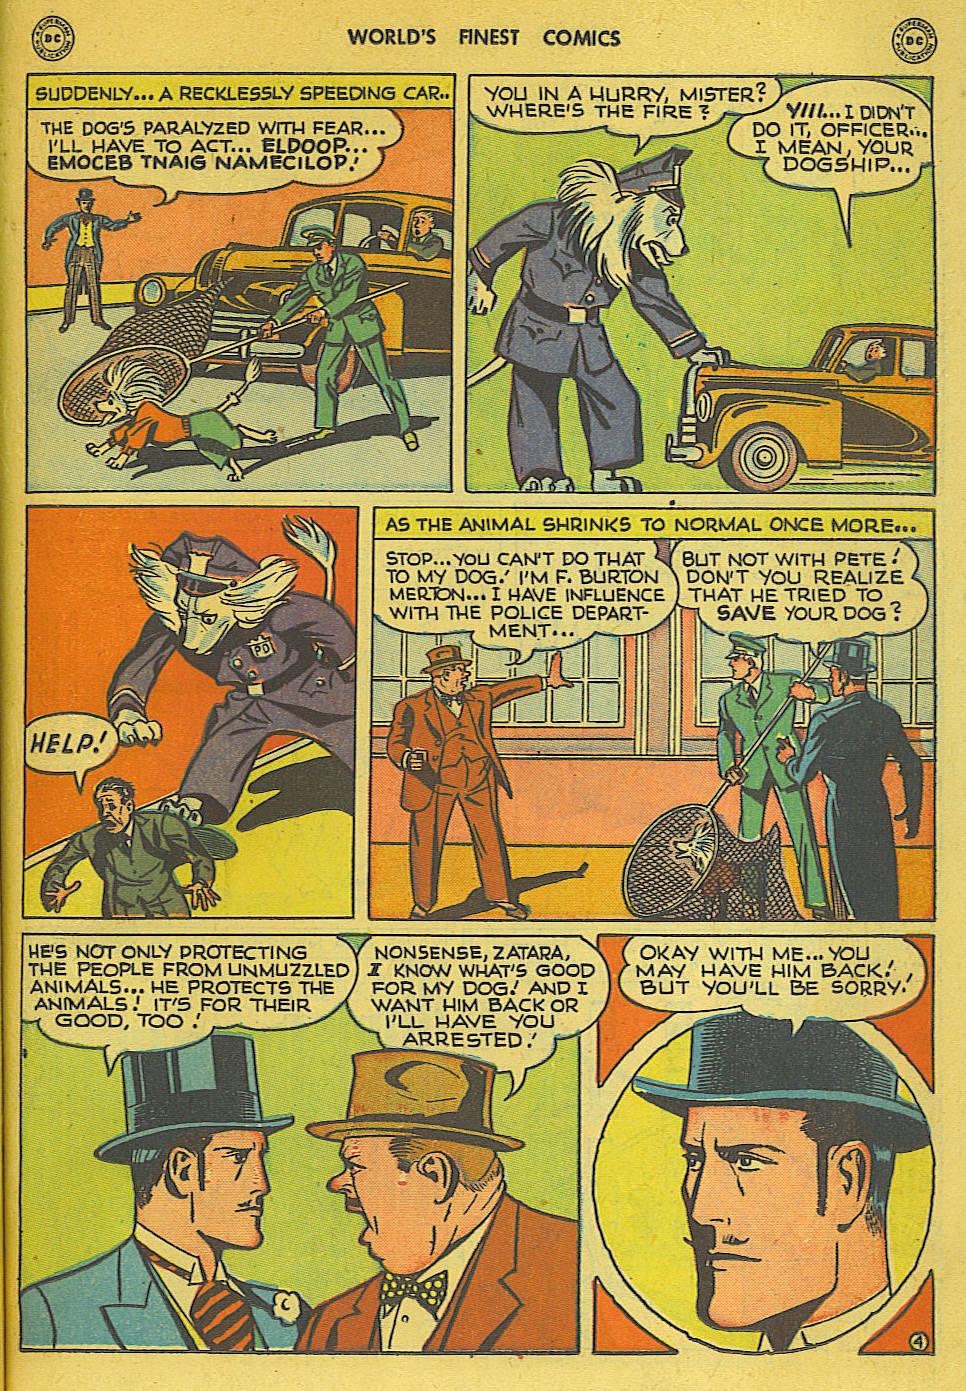 Read online World's Finest Comics comic -  Issue #34 - 57